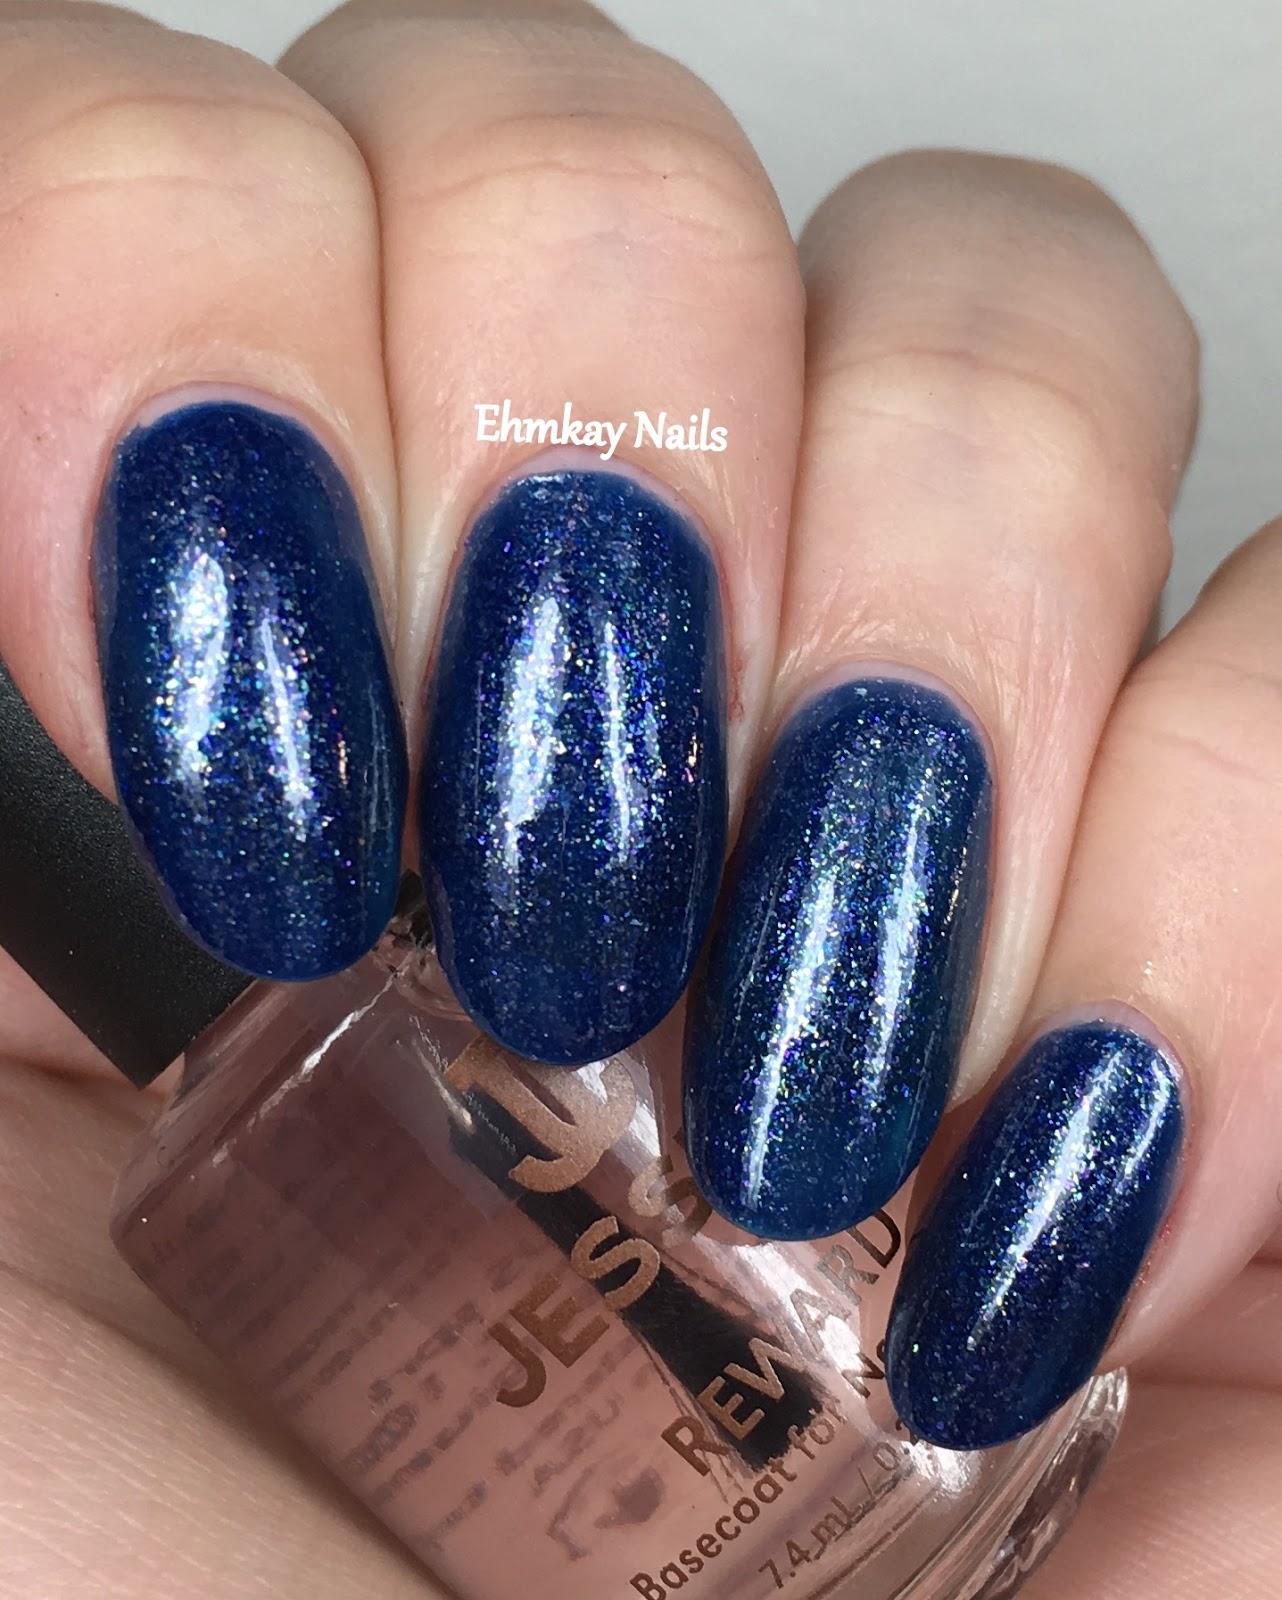 Jessica Nail Polish Gift Sets - To Bend Light